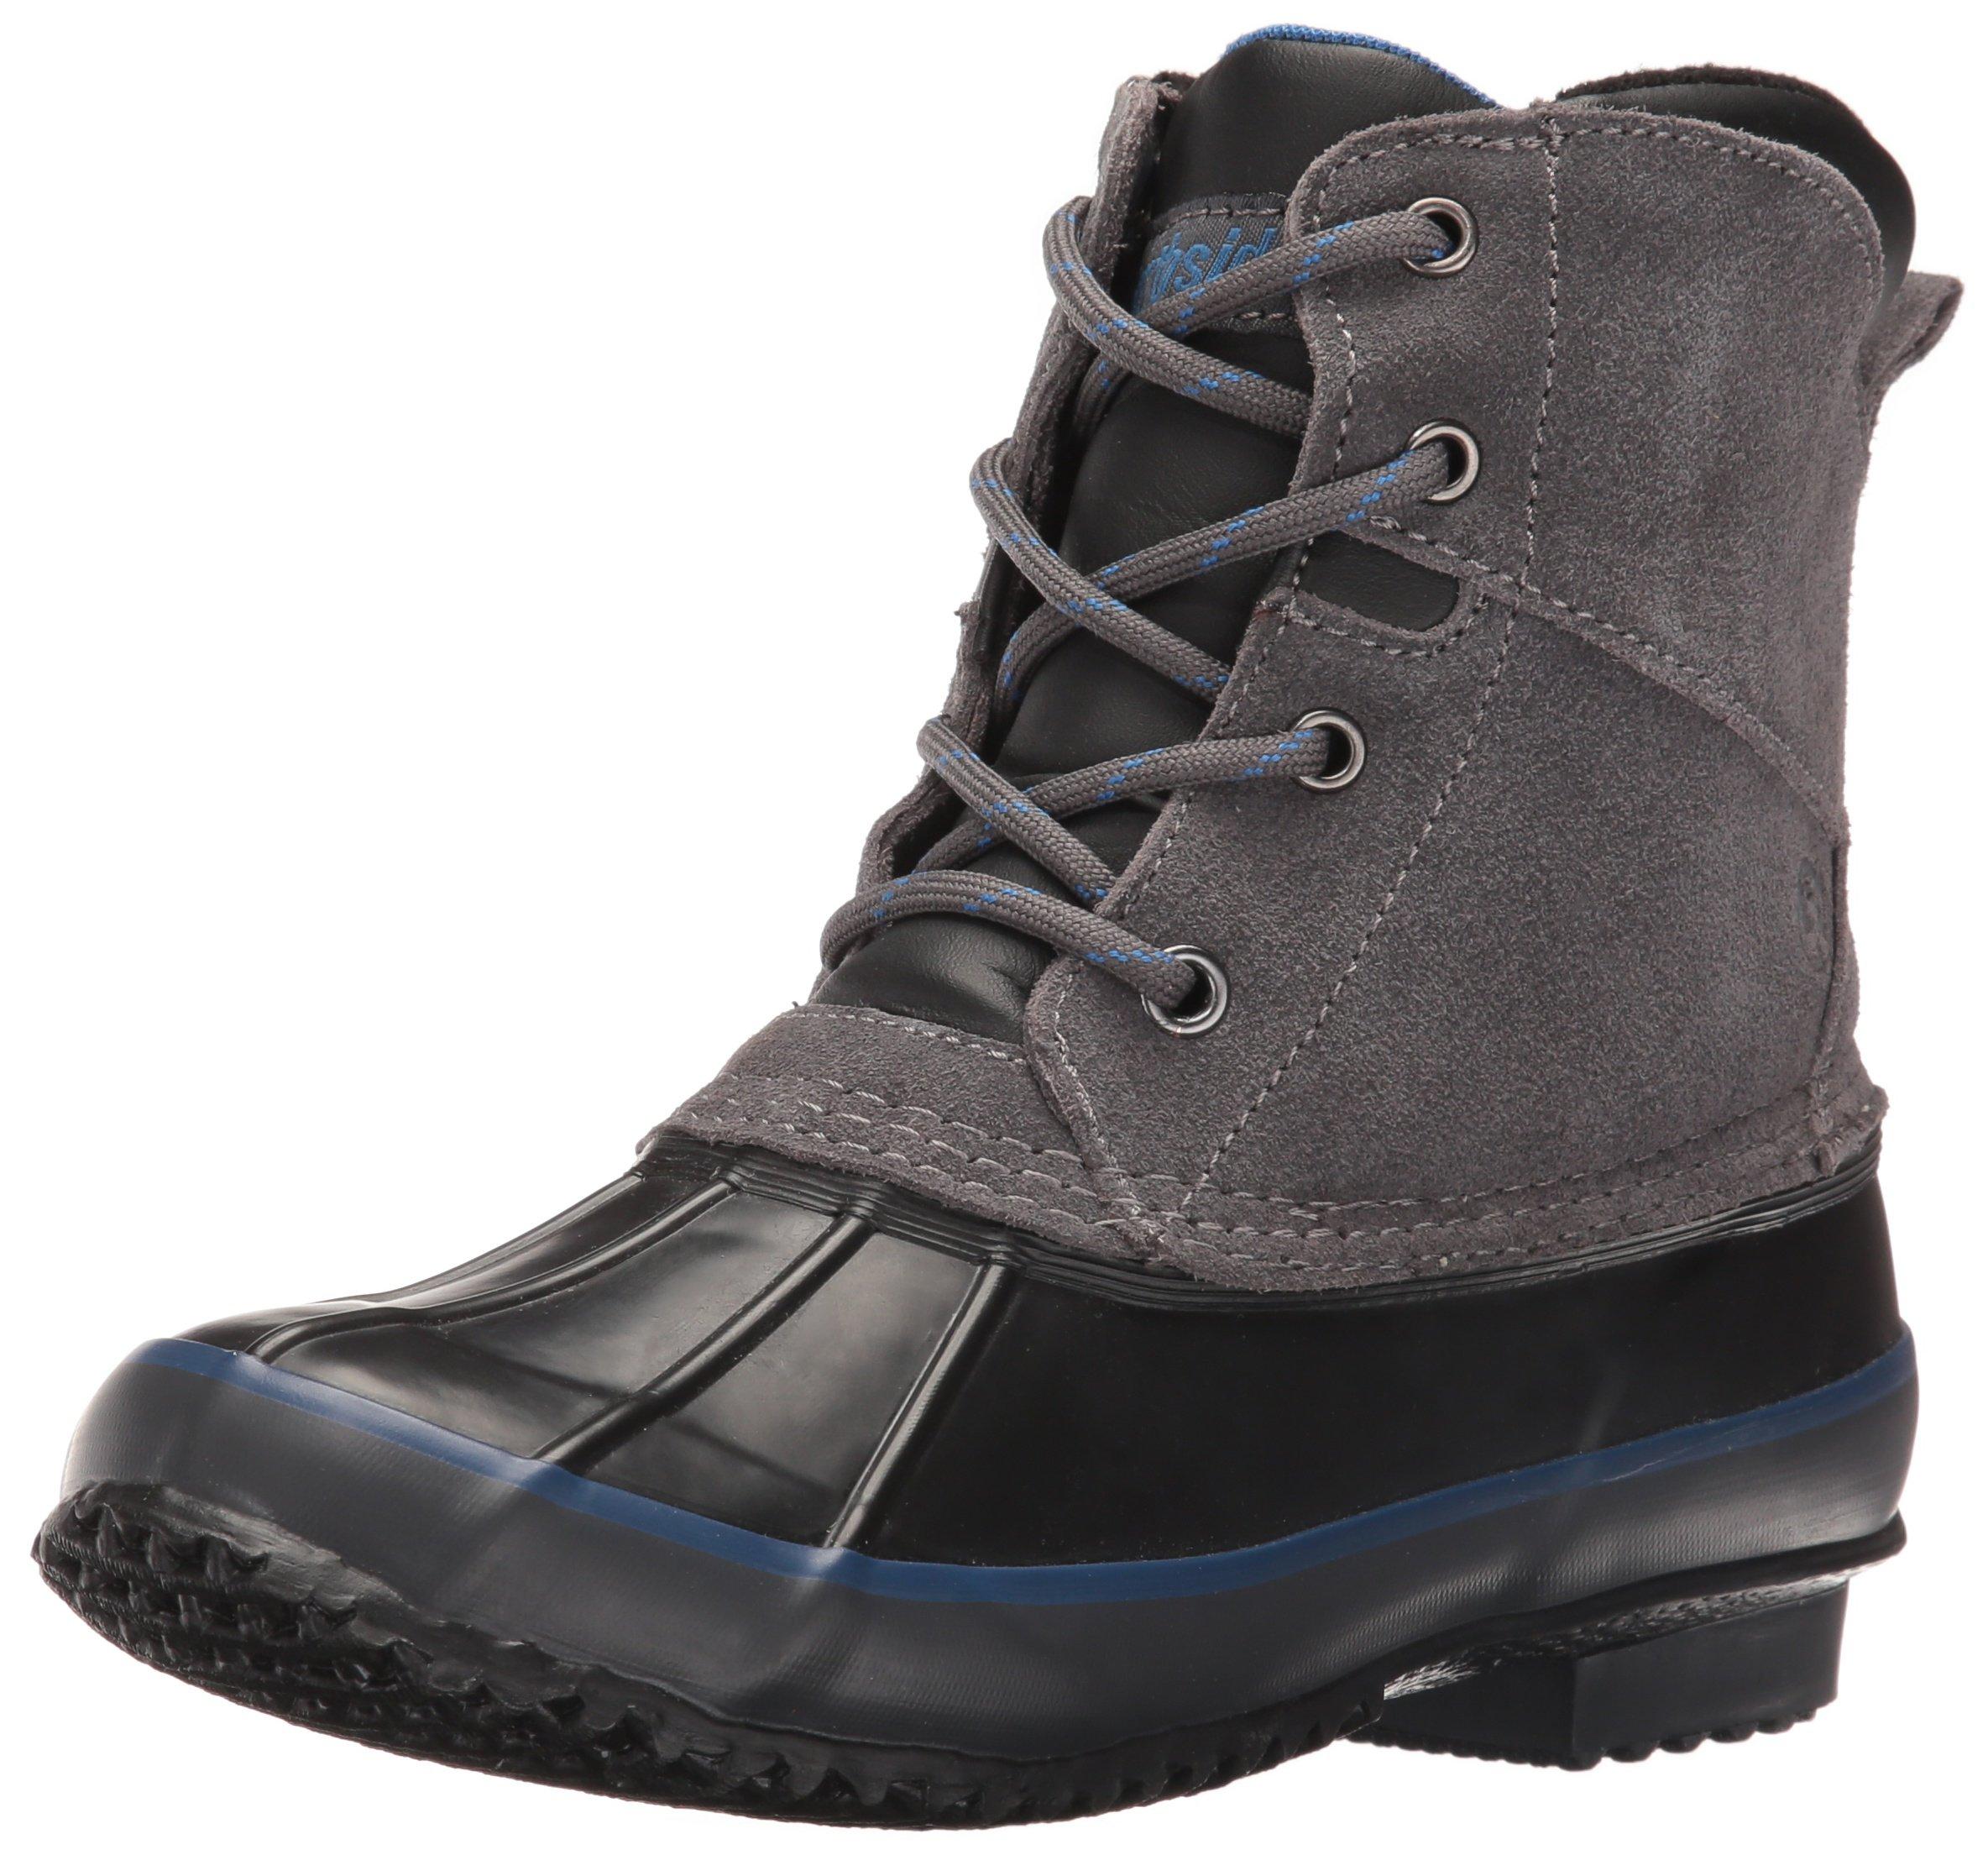 Northside Lewiston Boy's Waterproof Lace-up Duck Boot (Little Kid/Big Kid),Charcoal,4 M US Big Kid